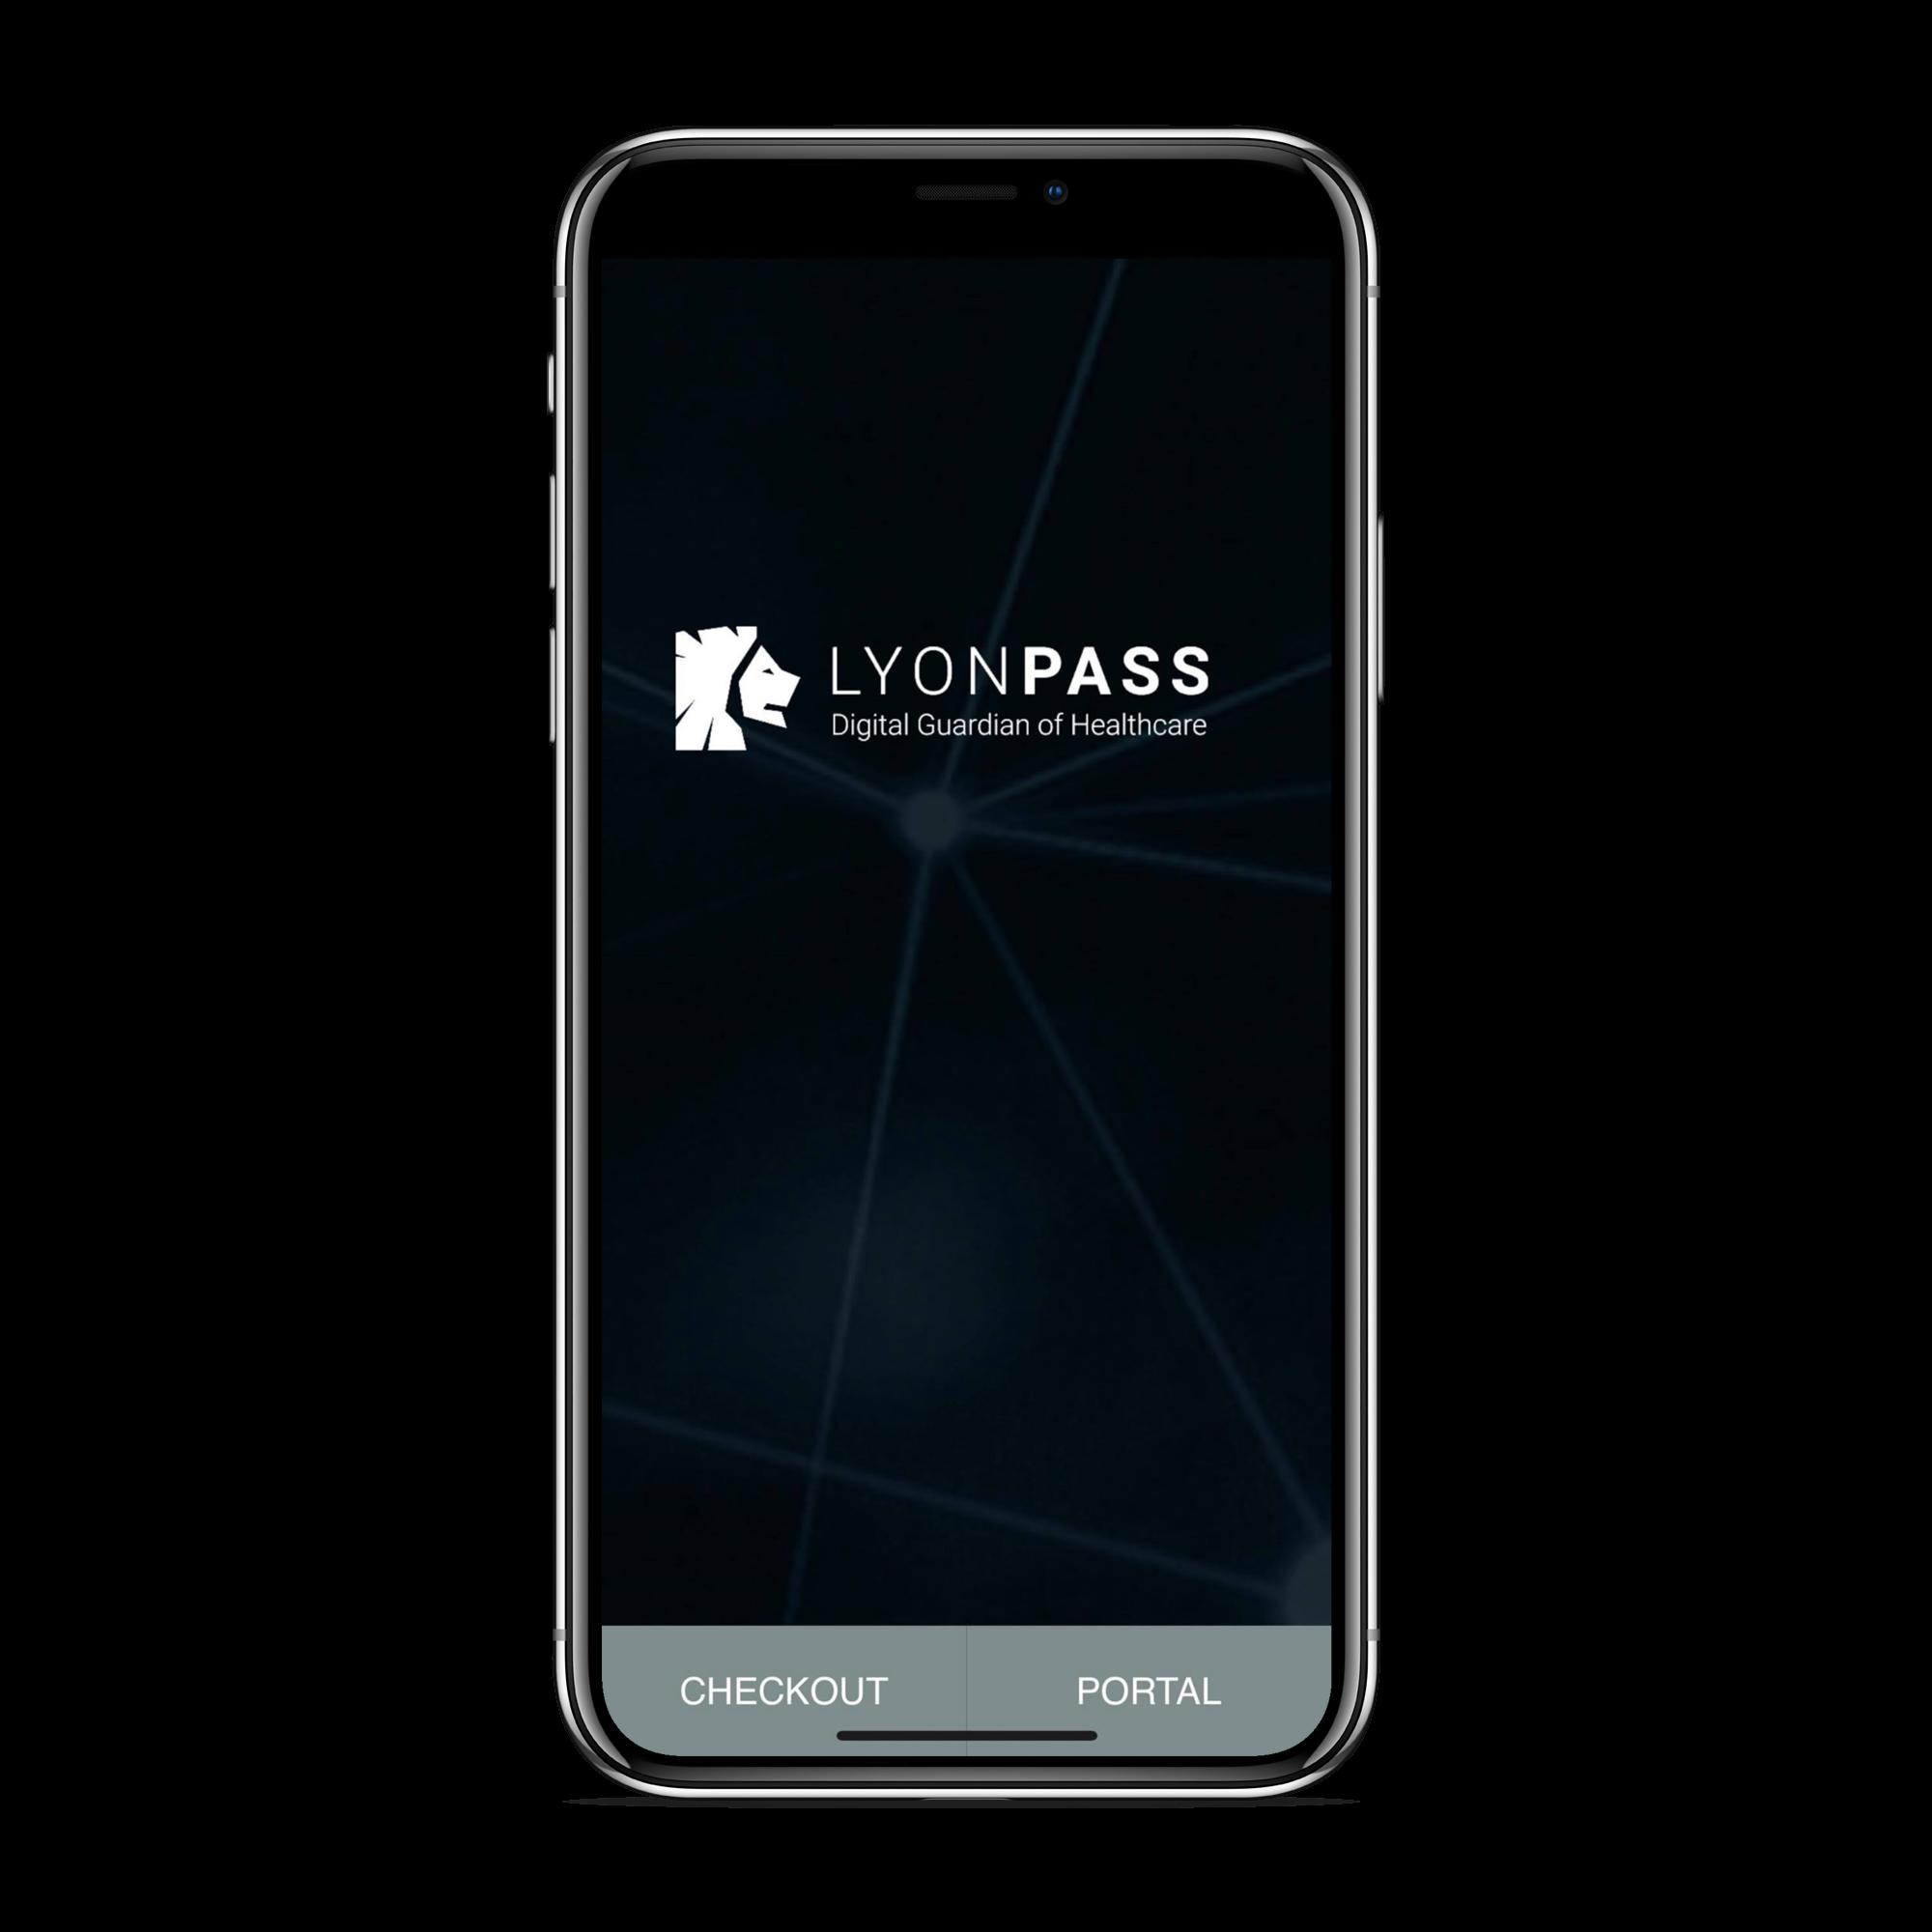 <br><br>LYONPASS MOBILE